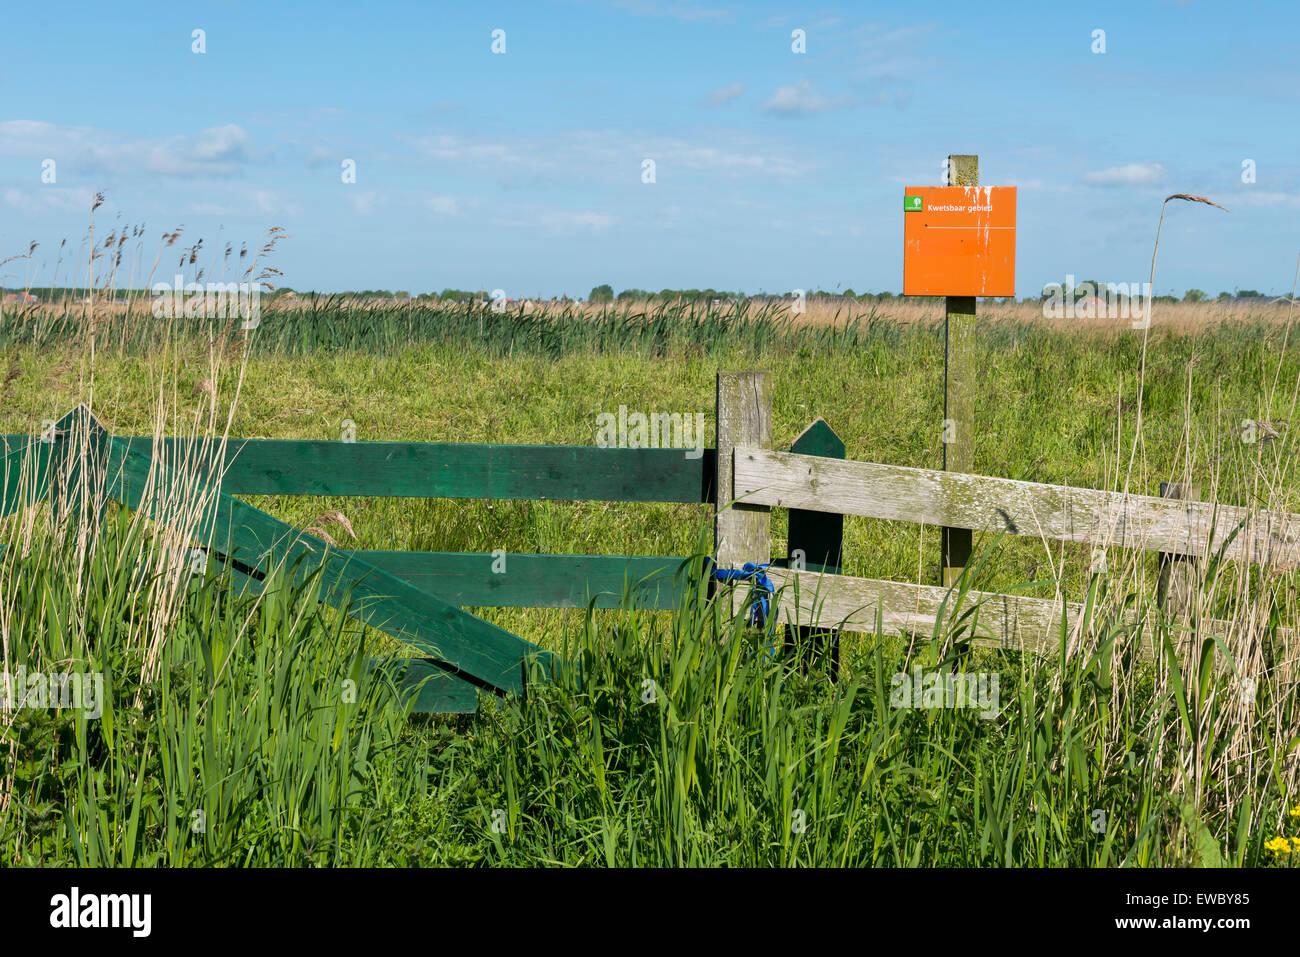 Fence of Sondeler Leien Nature Reserve in Friesland, The Netherlands, image Daan Kloeg, Commee - Stock Image